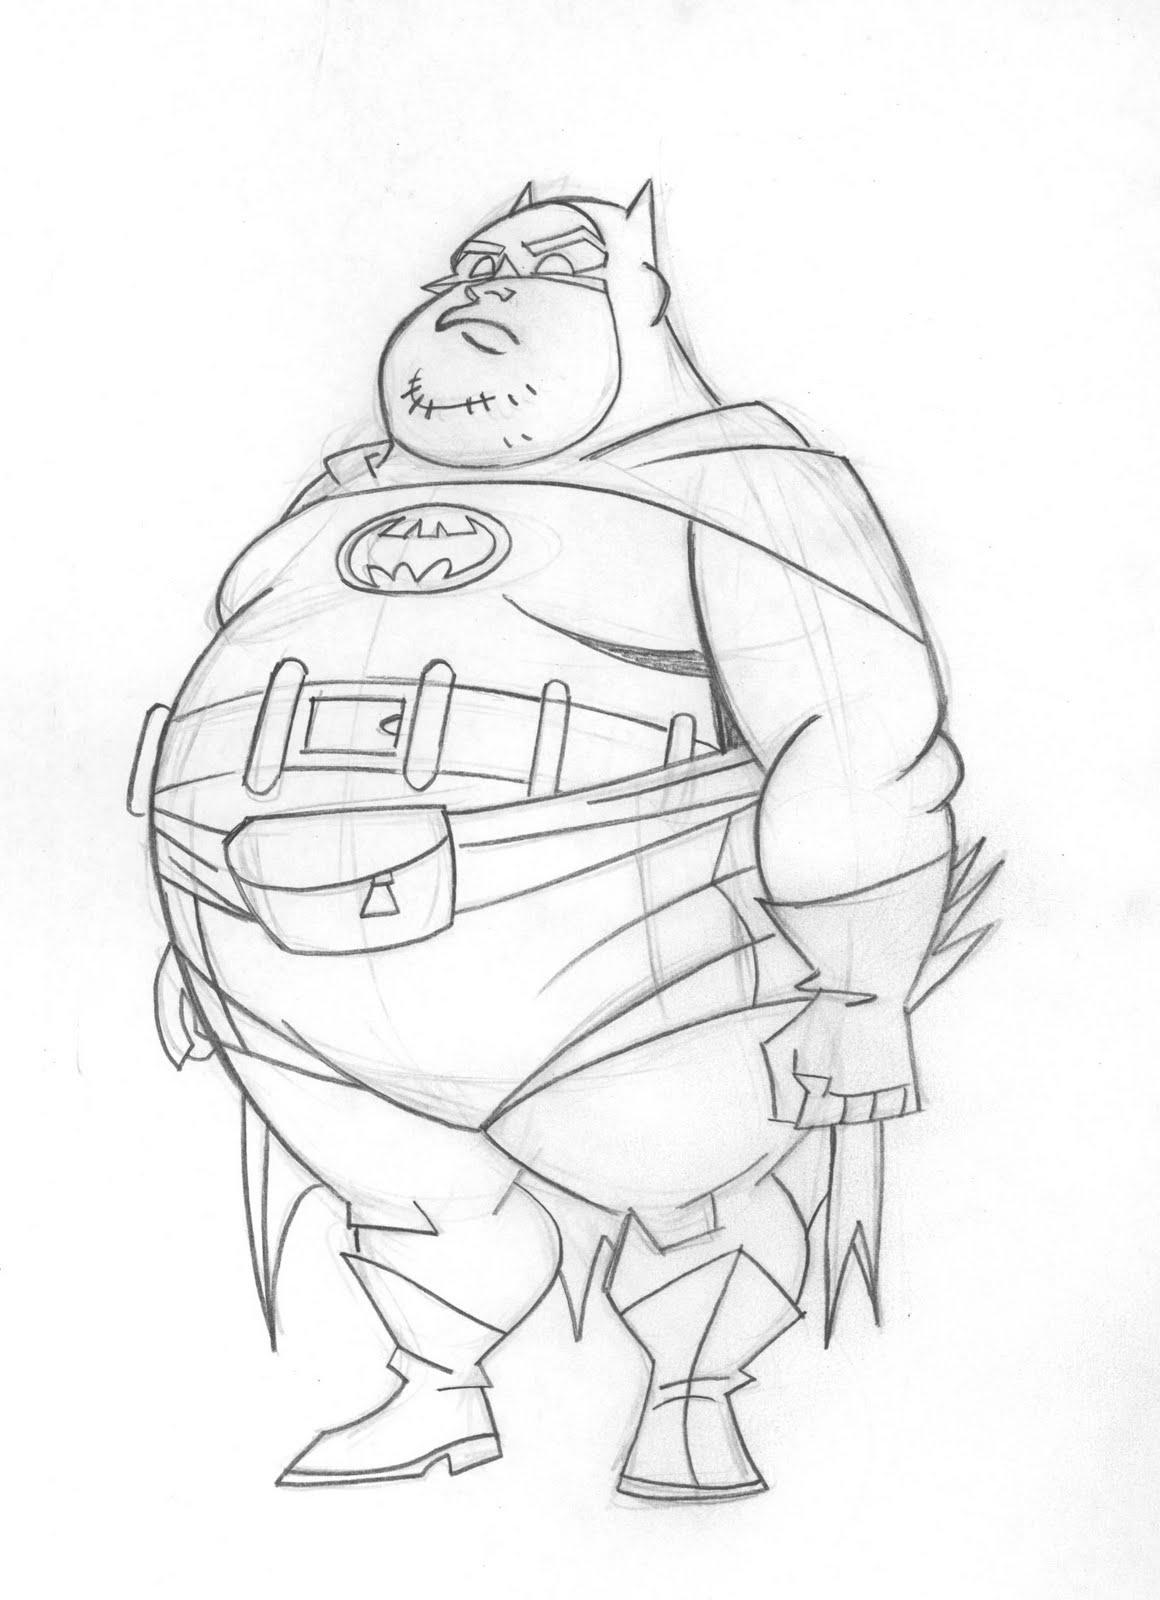 1160x1600 Drawing Pictures Of Batman Batman Drawings In Pencil Easy Batman